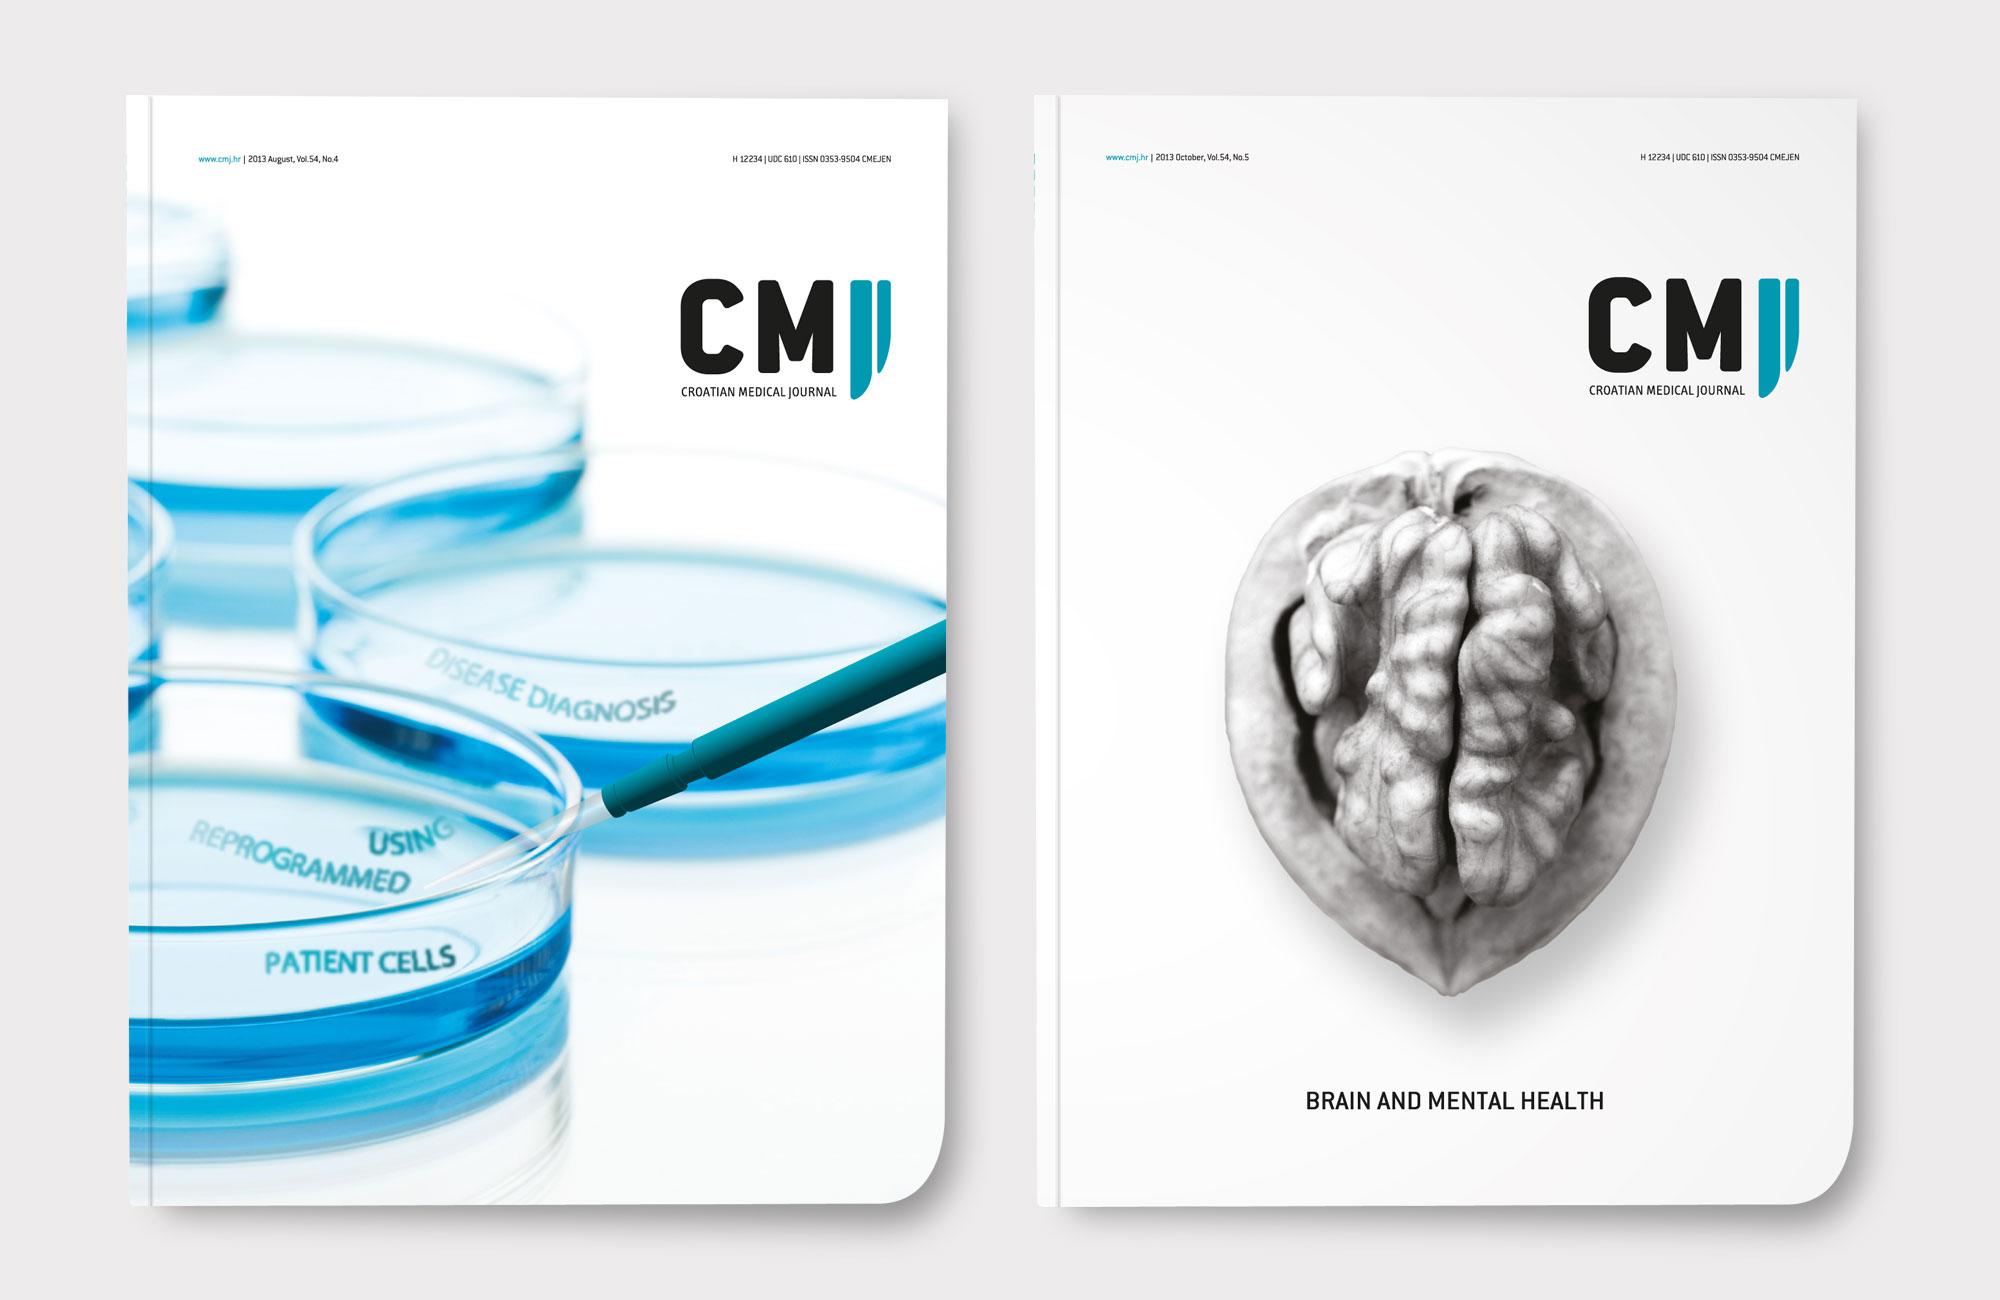 masavukmanovic.com - croatian medical journal 11